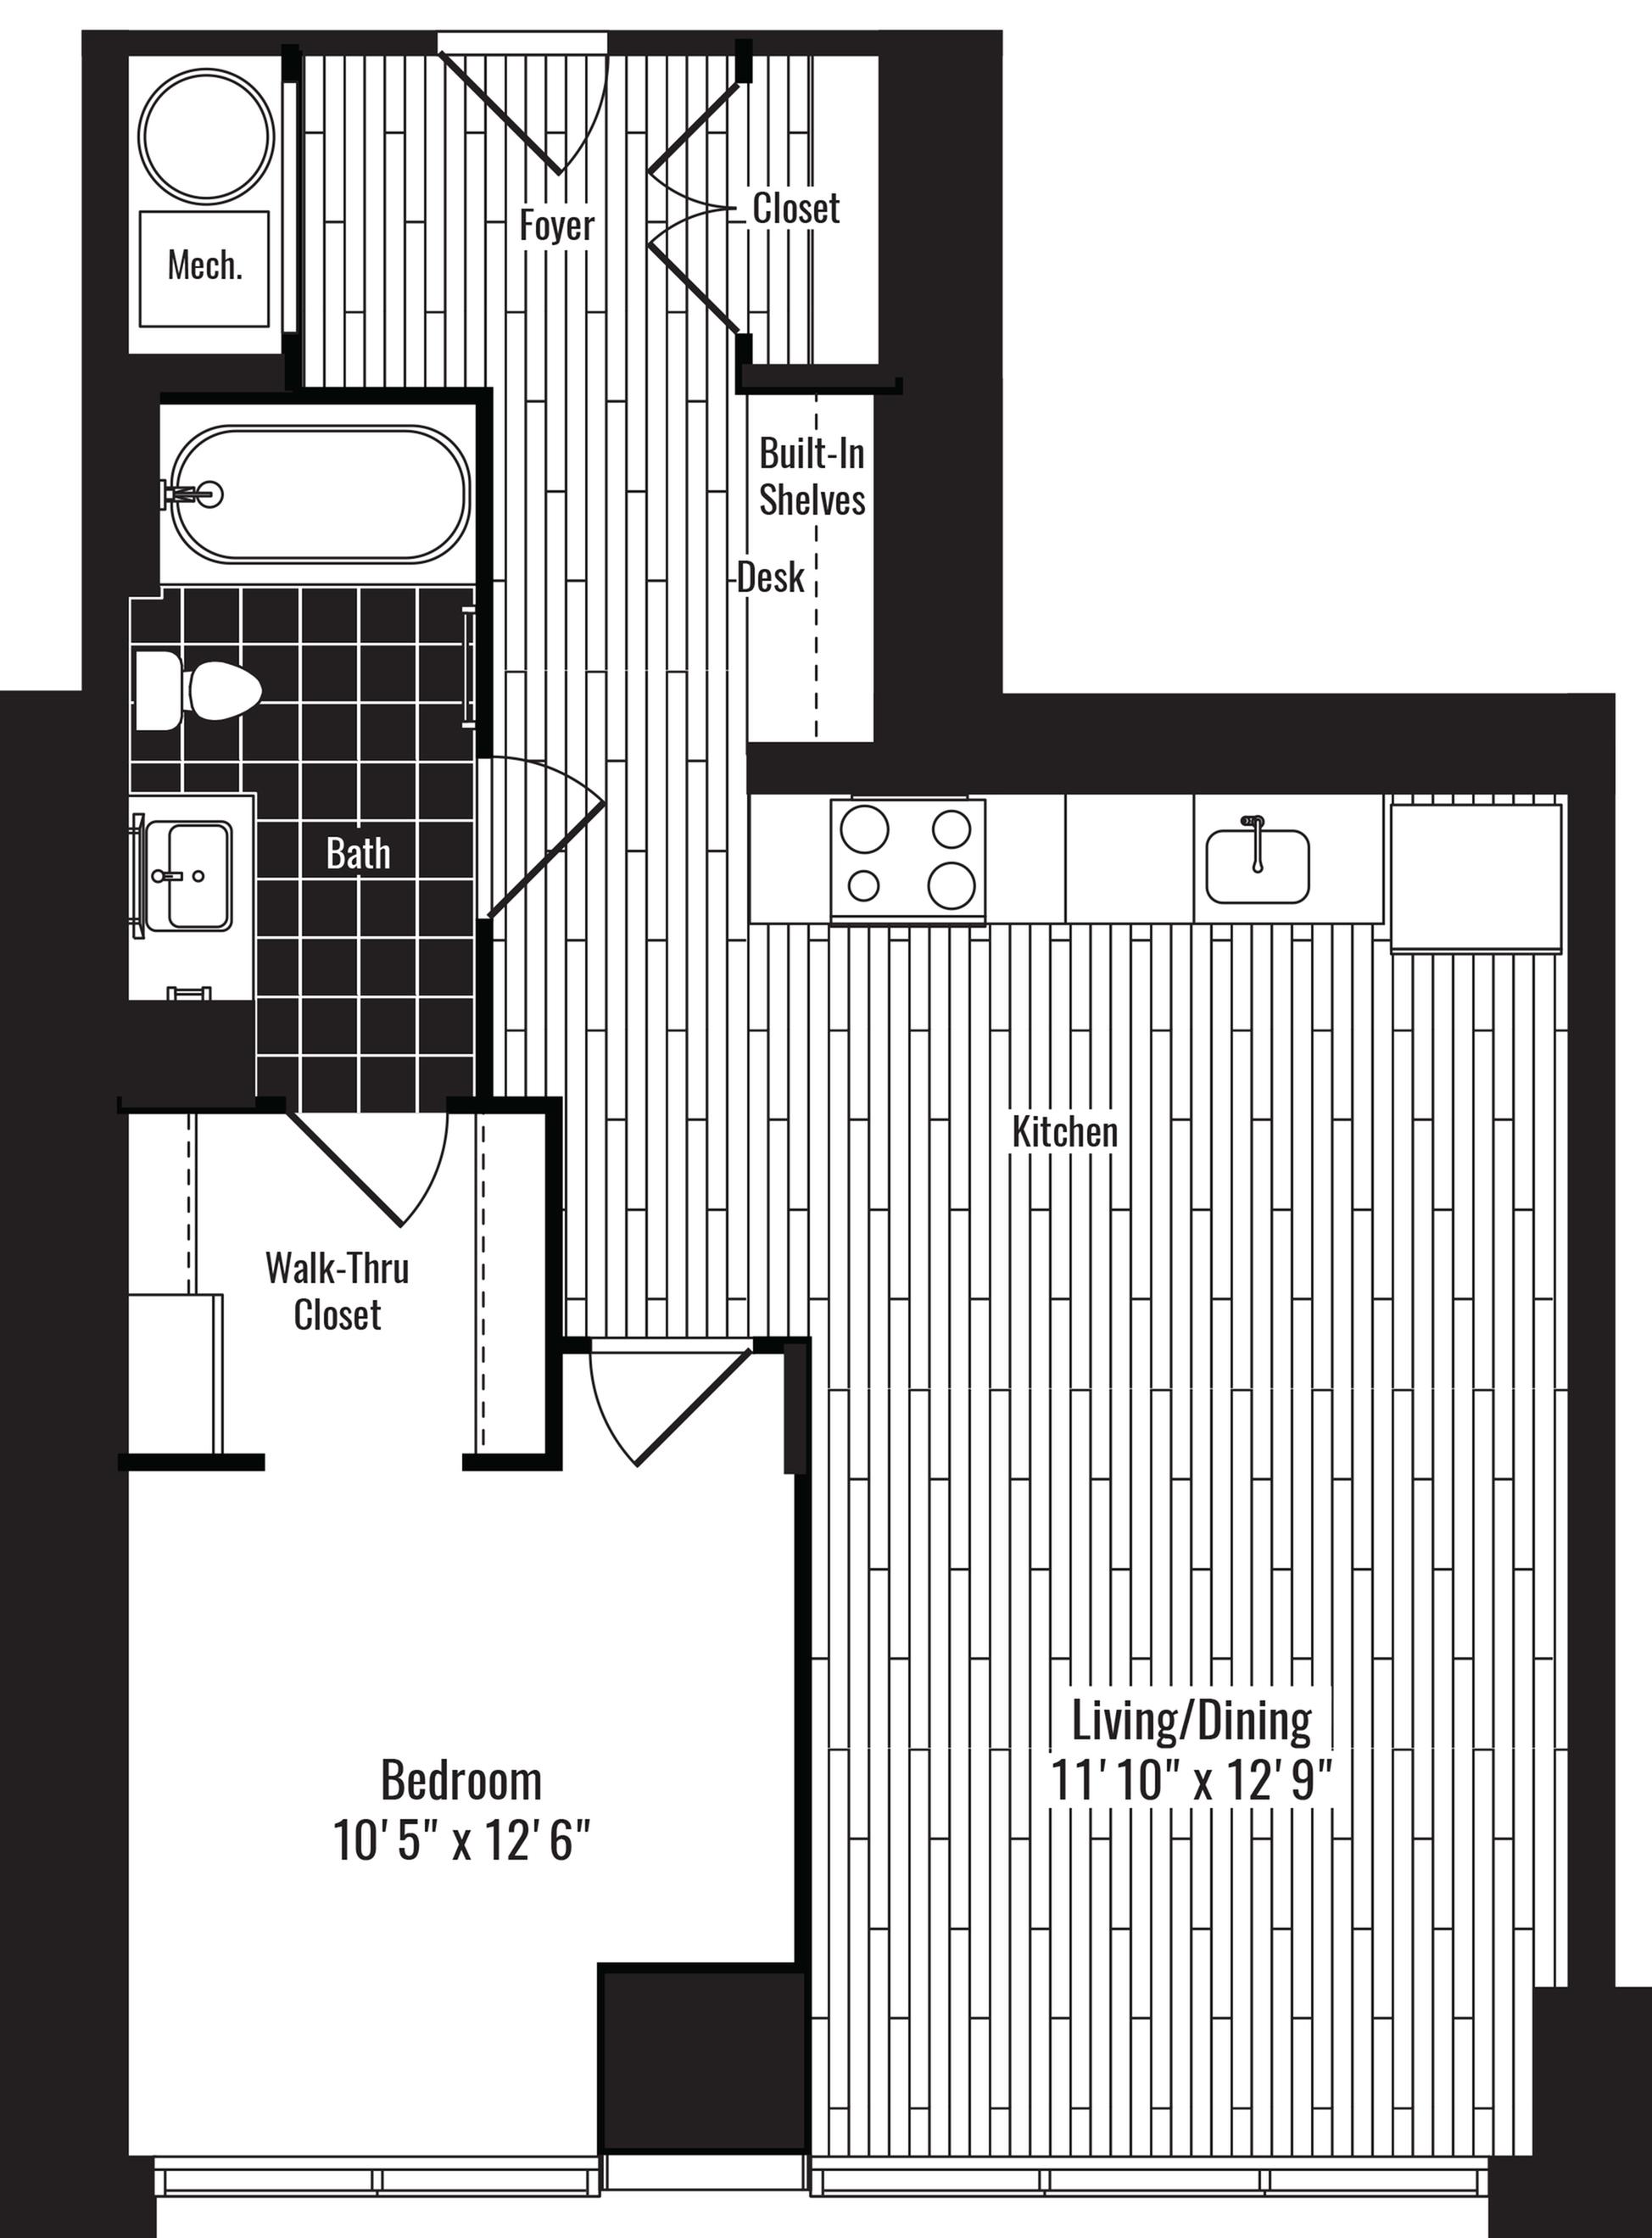 697 square foot one bedroom one bath apartment floorplan image